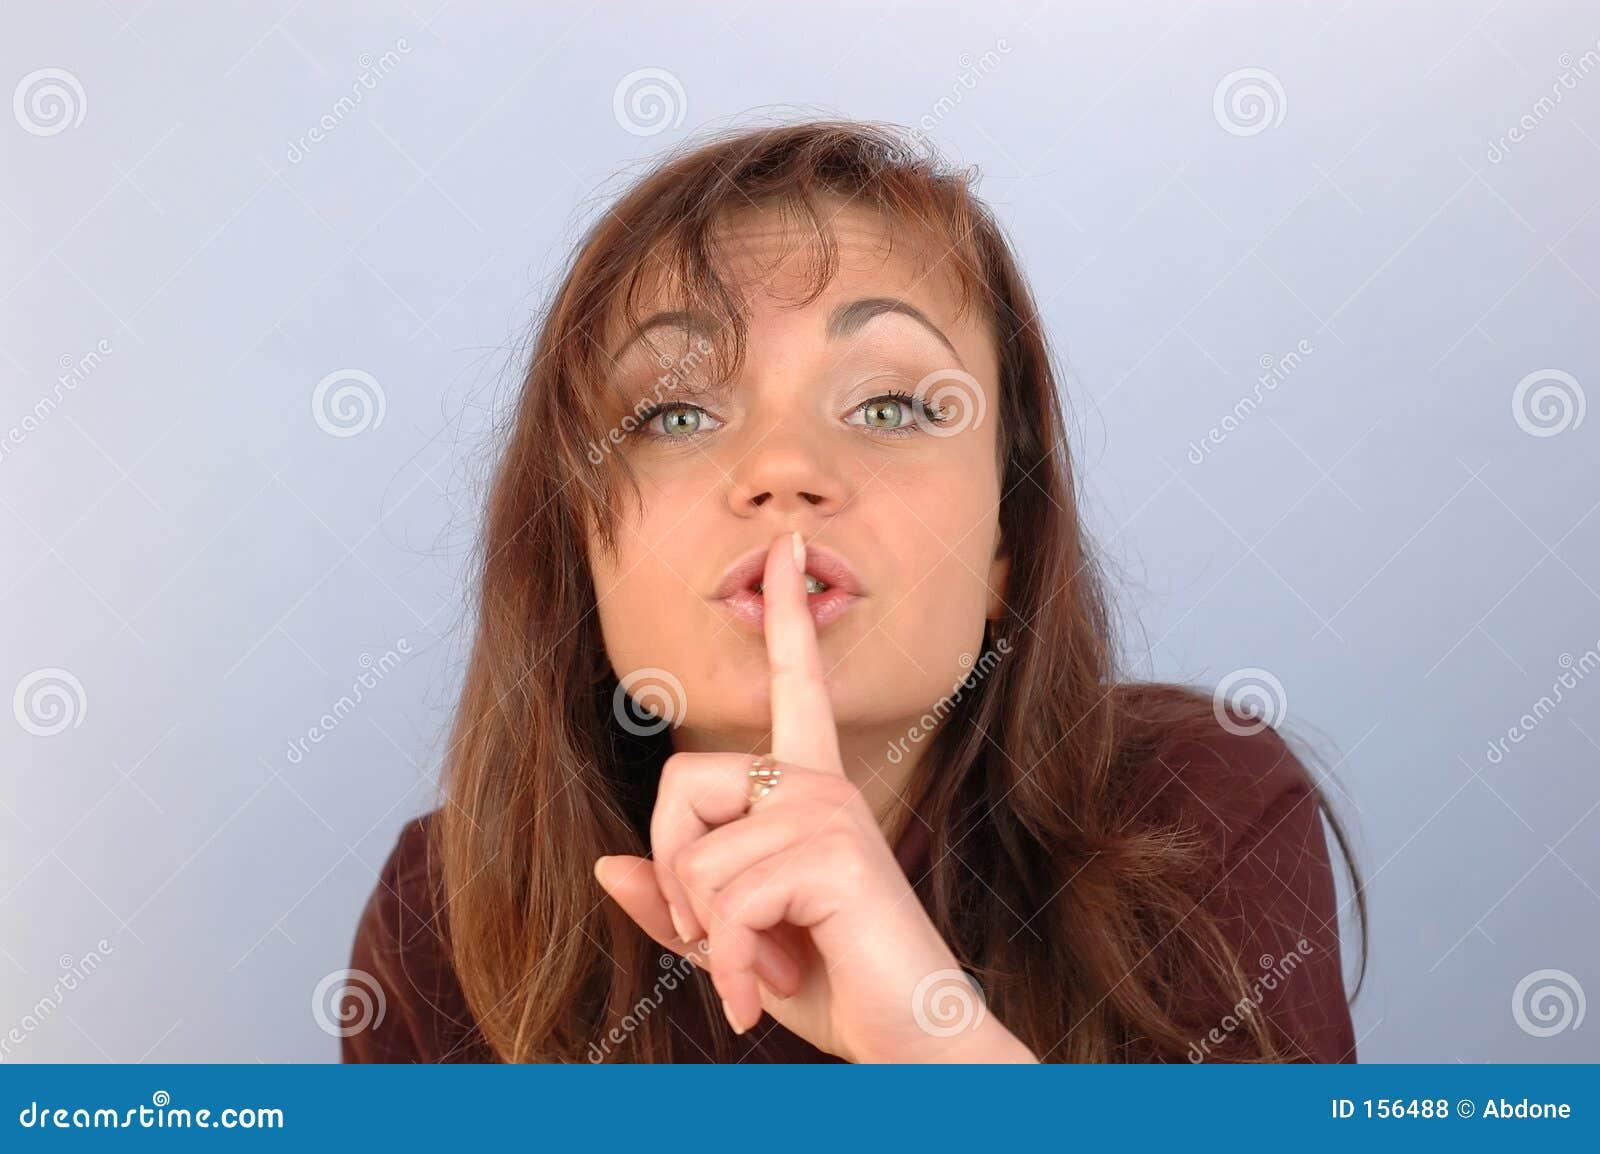 Be quiet...